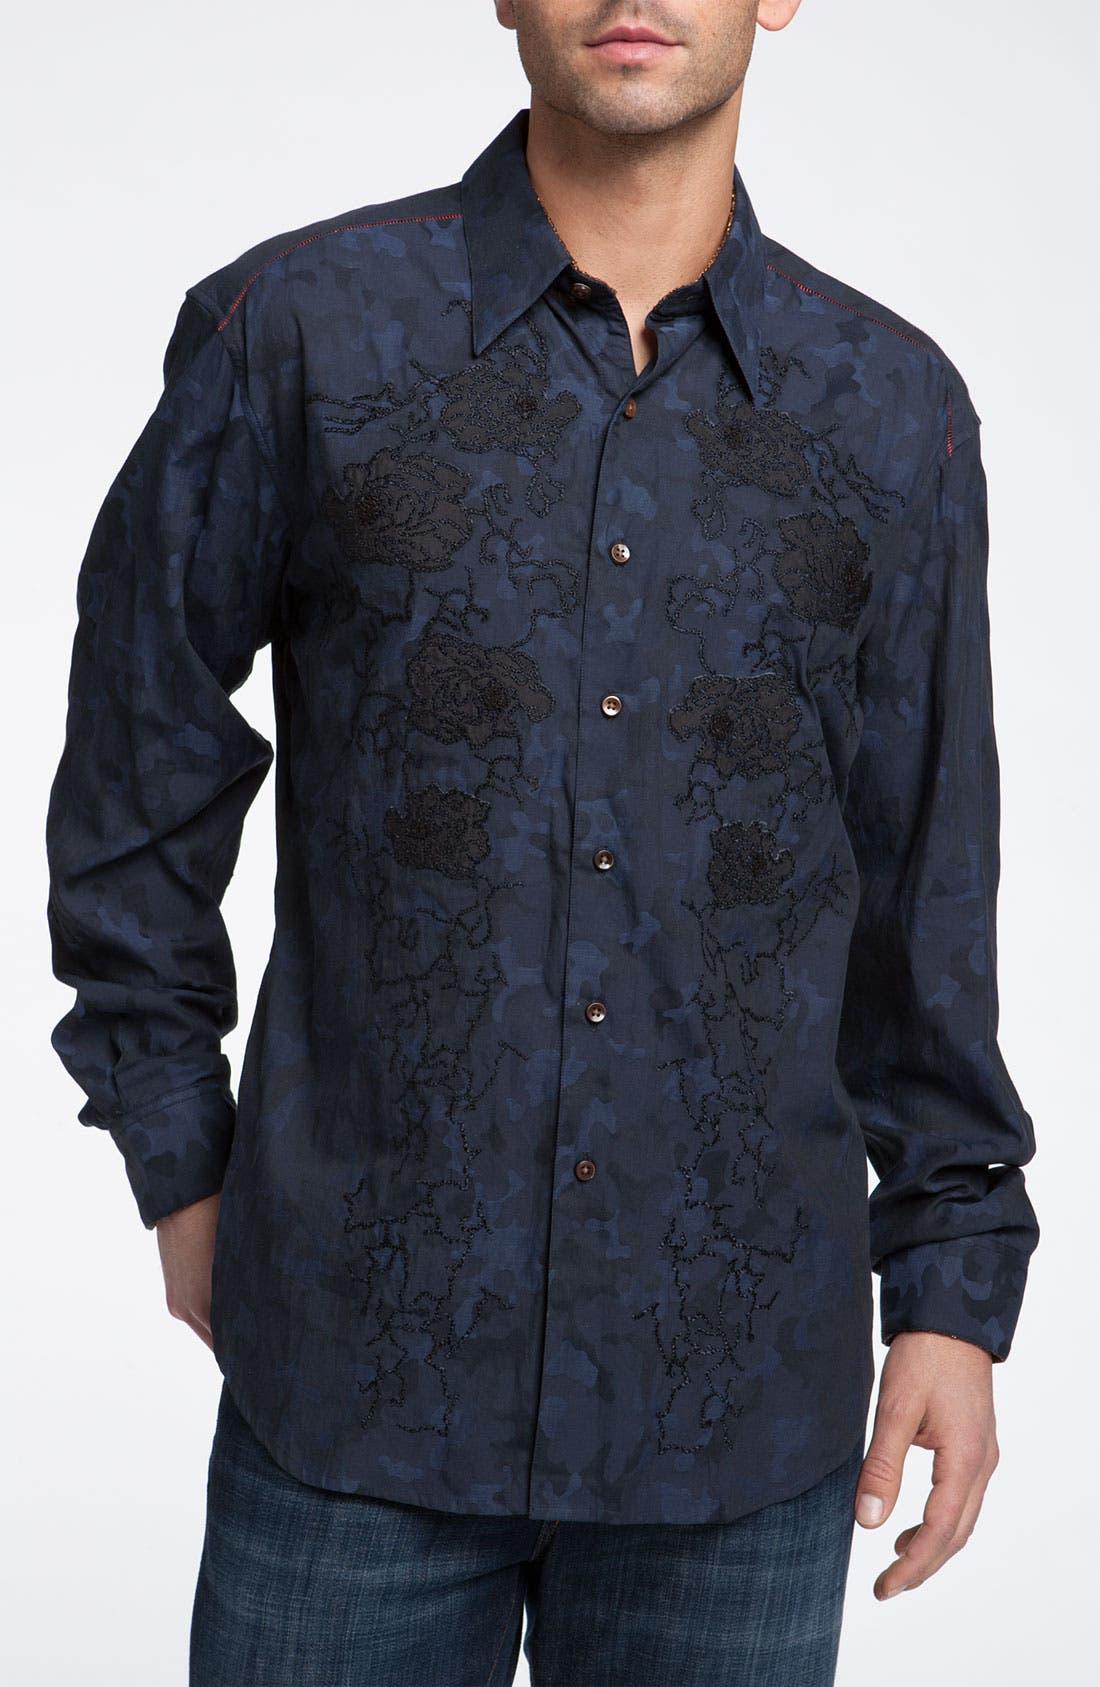 Alternate Image 1 Selected - Robert Graham 'Tchou' Sport Shirt (Limited Edition)